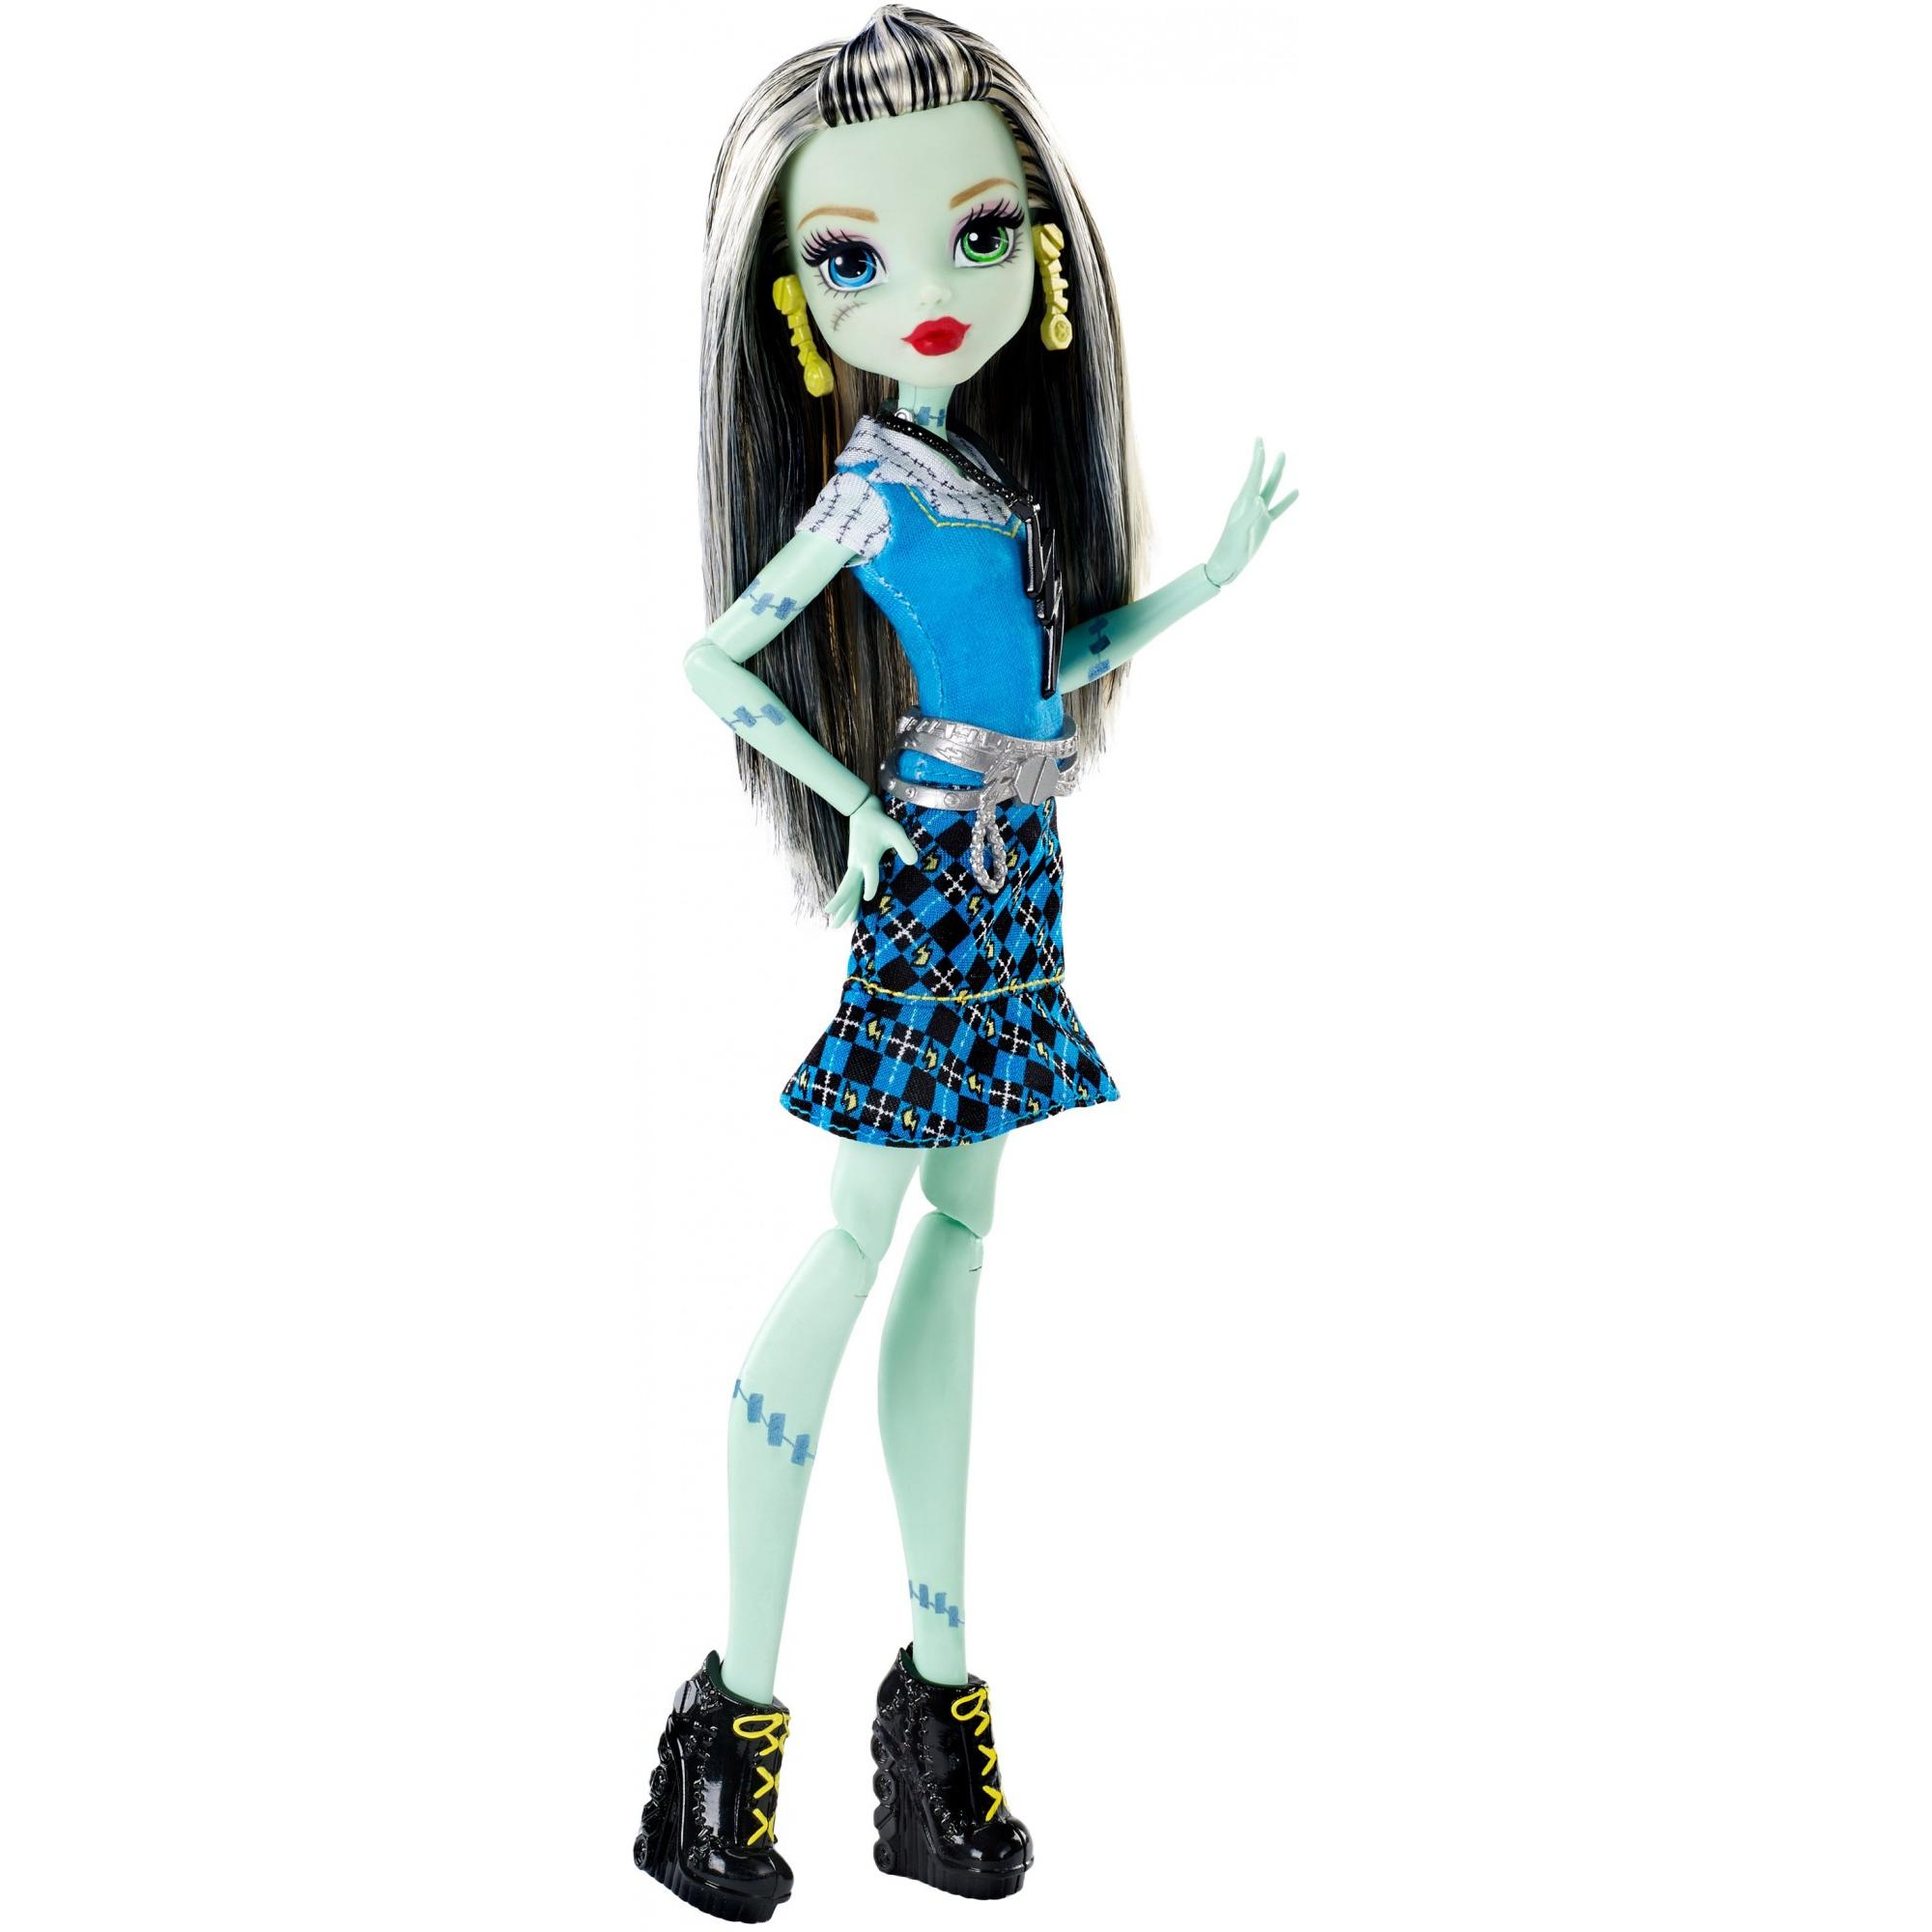 Monster High First Day of School Frankie Stein Doll by Mattel